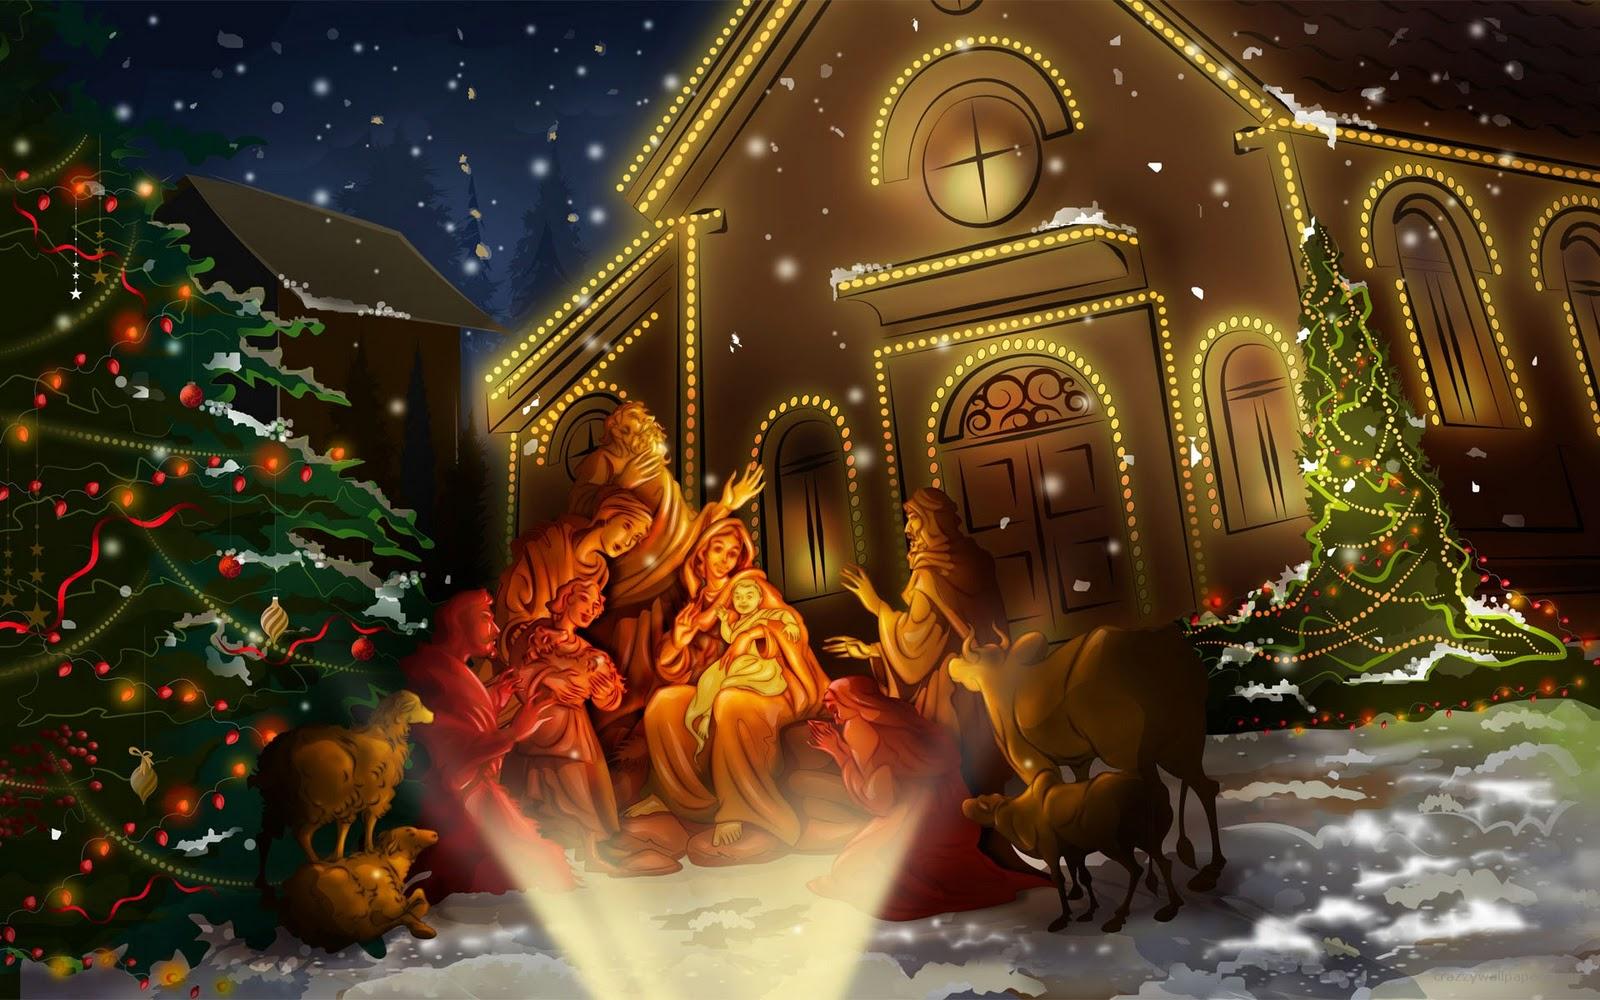 animated christmas wallpapers free |Desktop Wallpapers